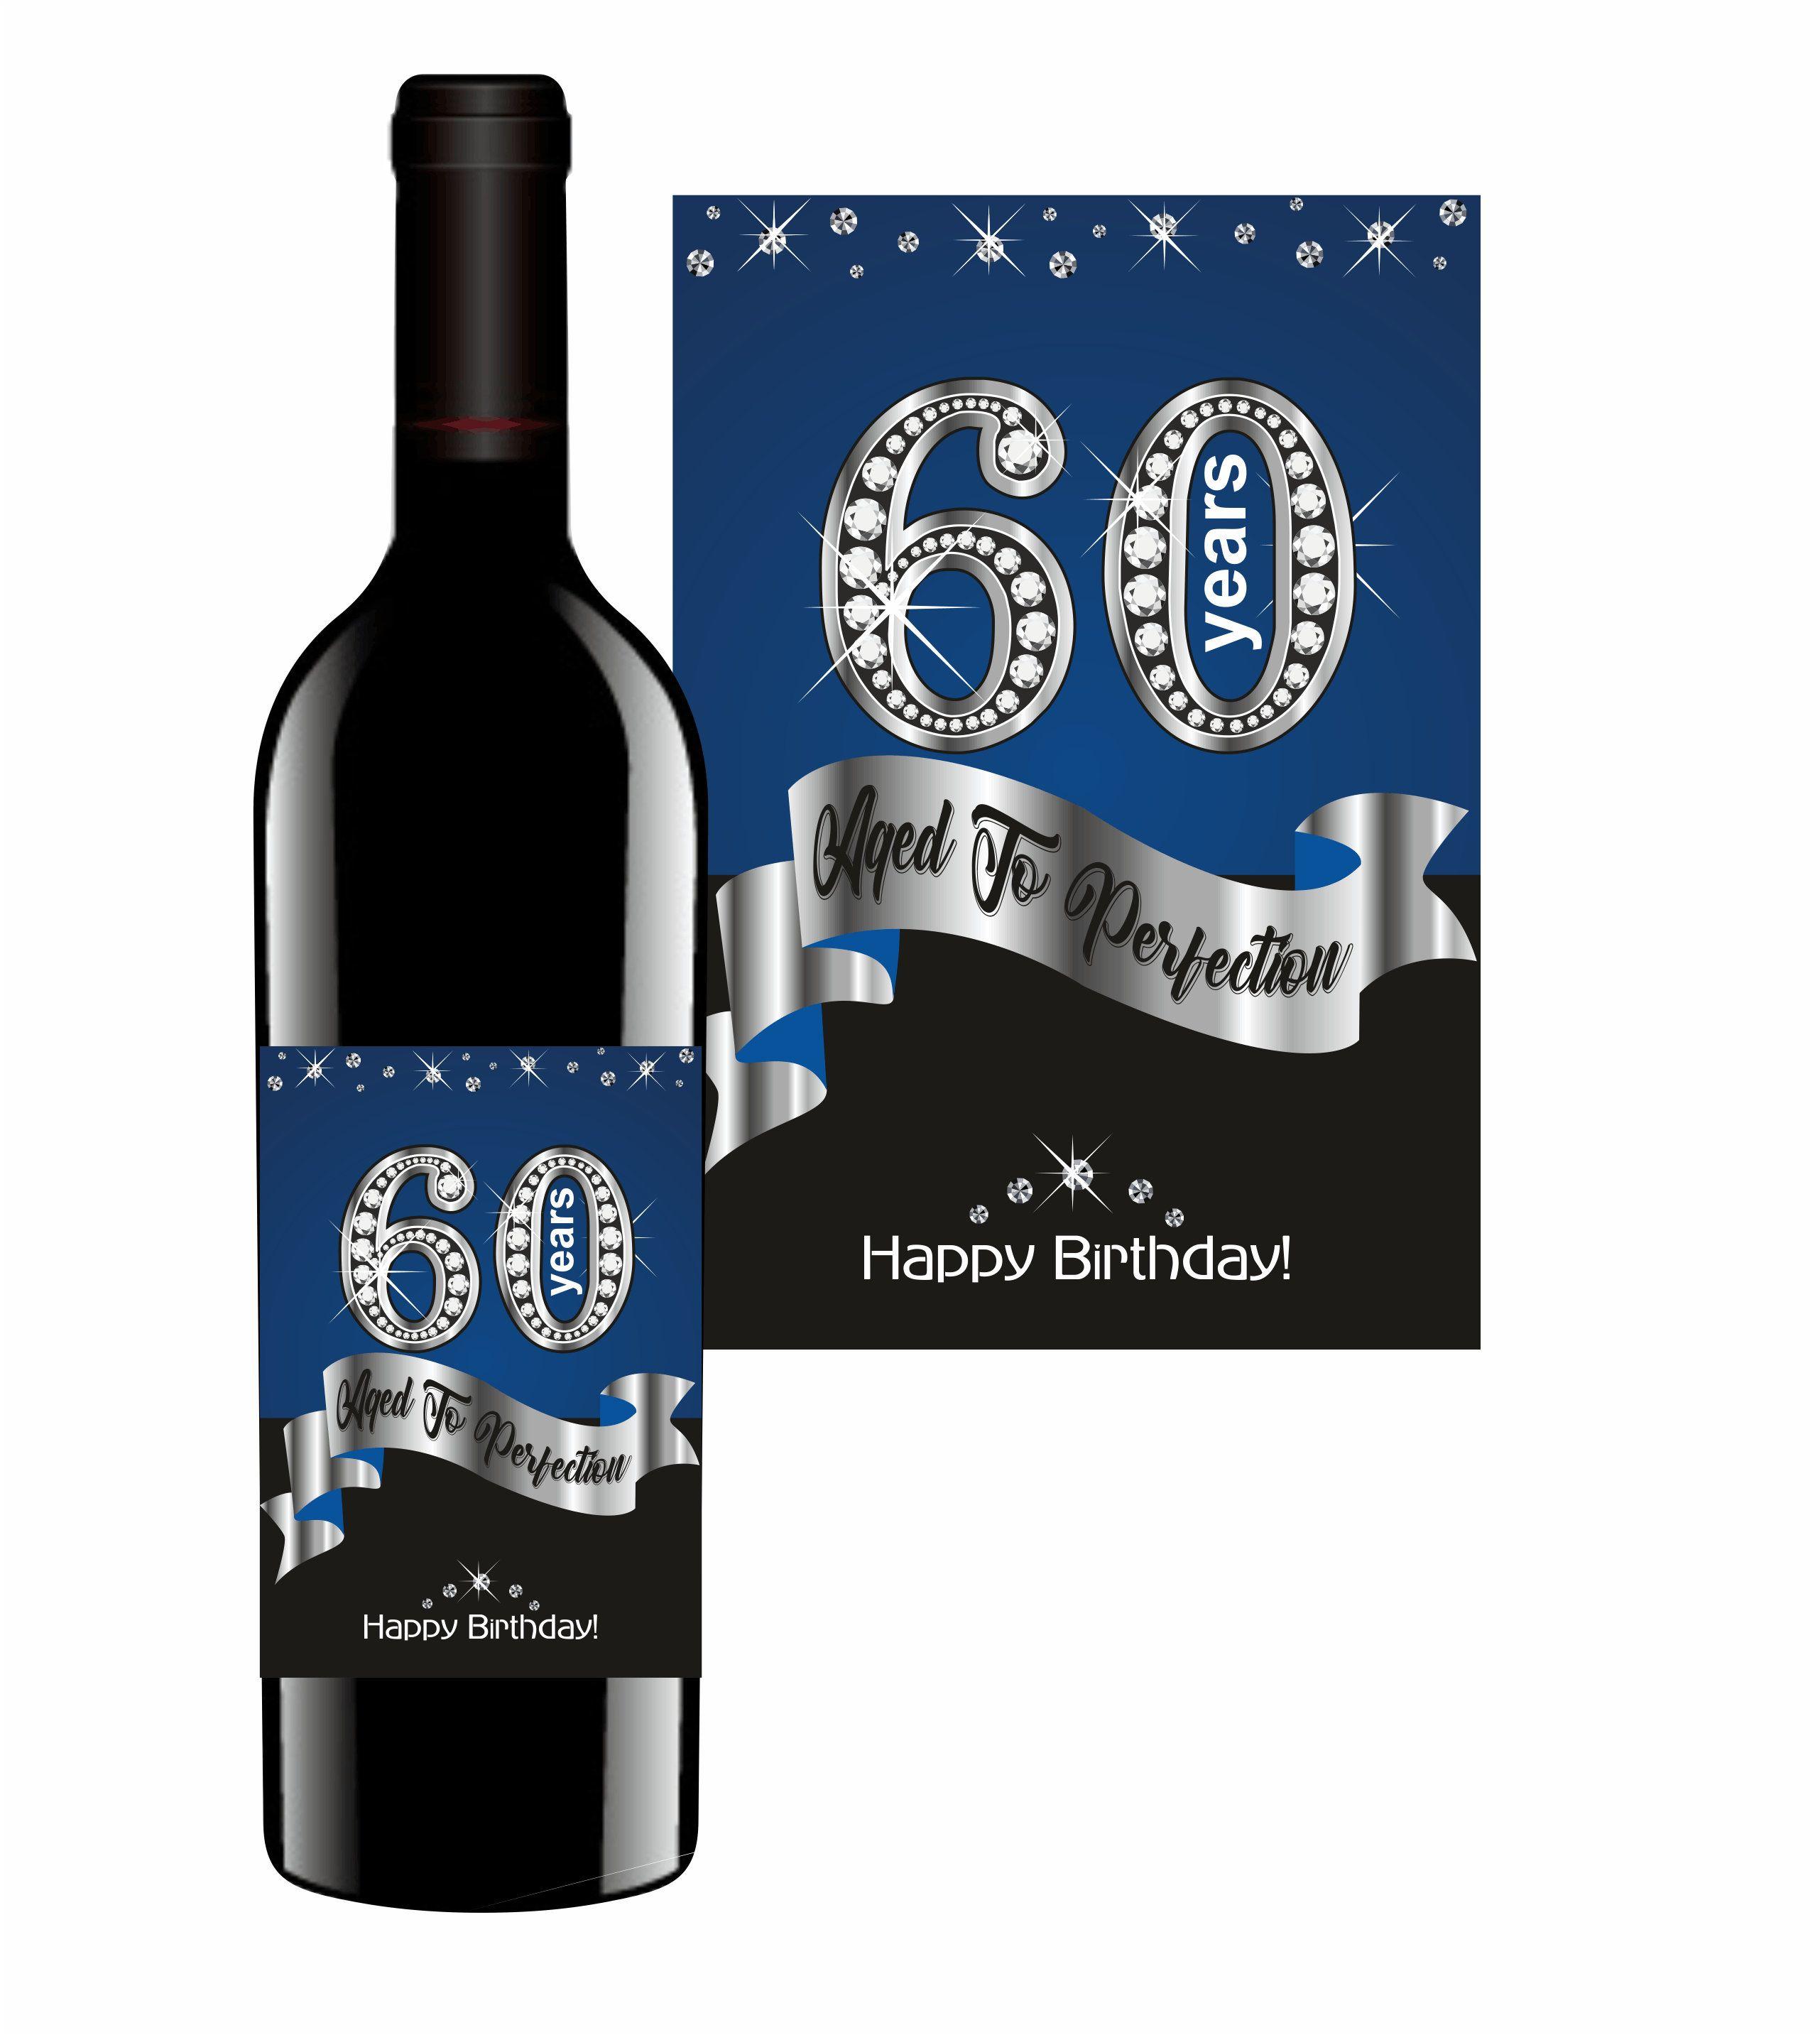 Custom Happy Birthday Wine Label Vintage Bottle Labels First 21st